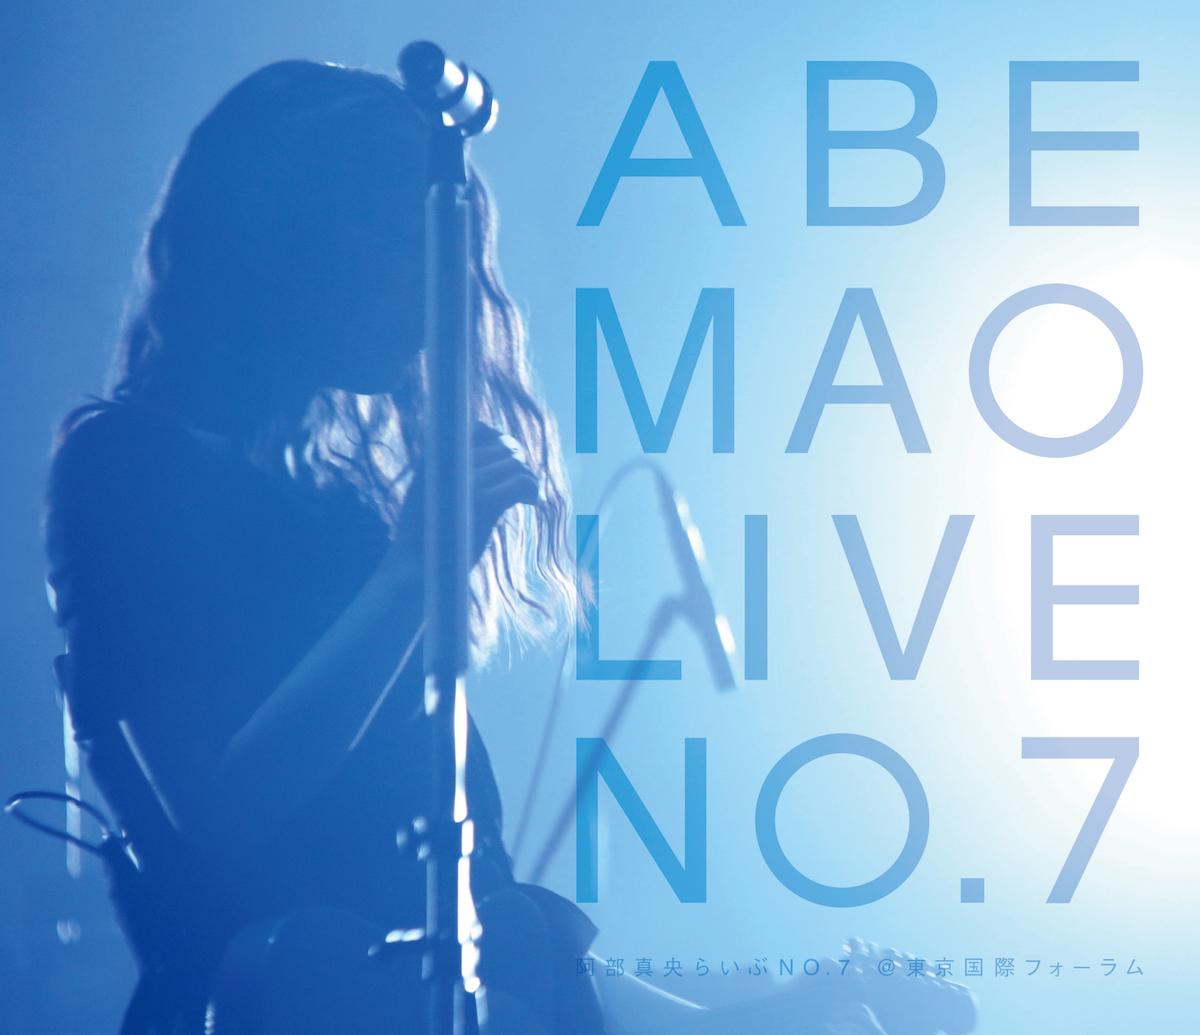 LIVE DVD&Blu-ray『阿部真央らいぶNo.7@東京国際フォーラム』【PCSC限定盤】